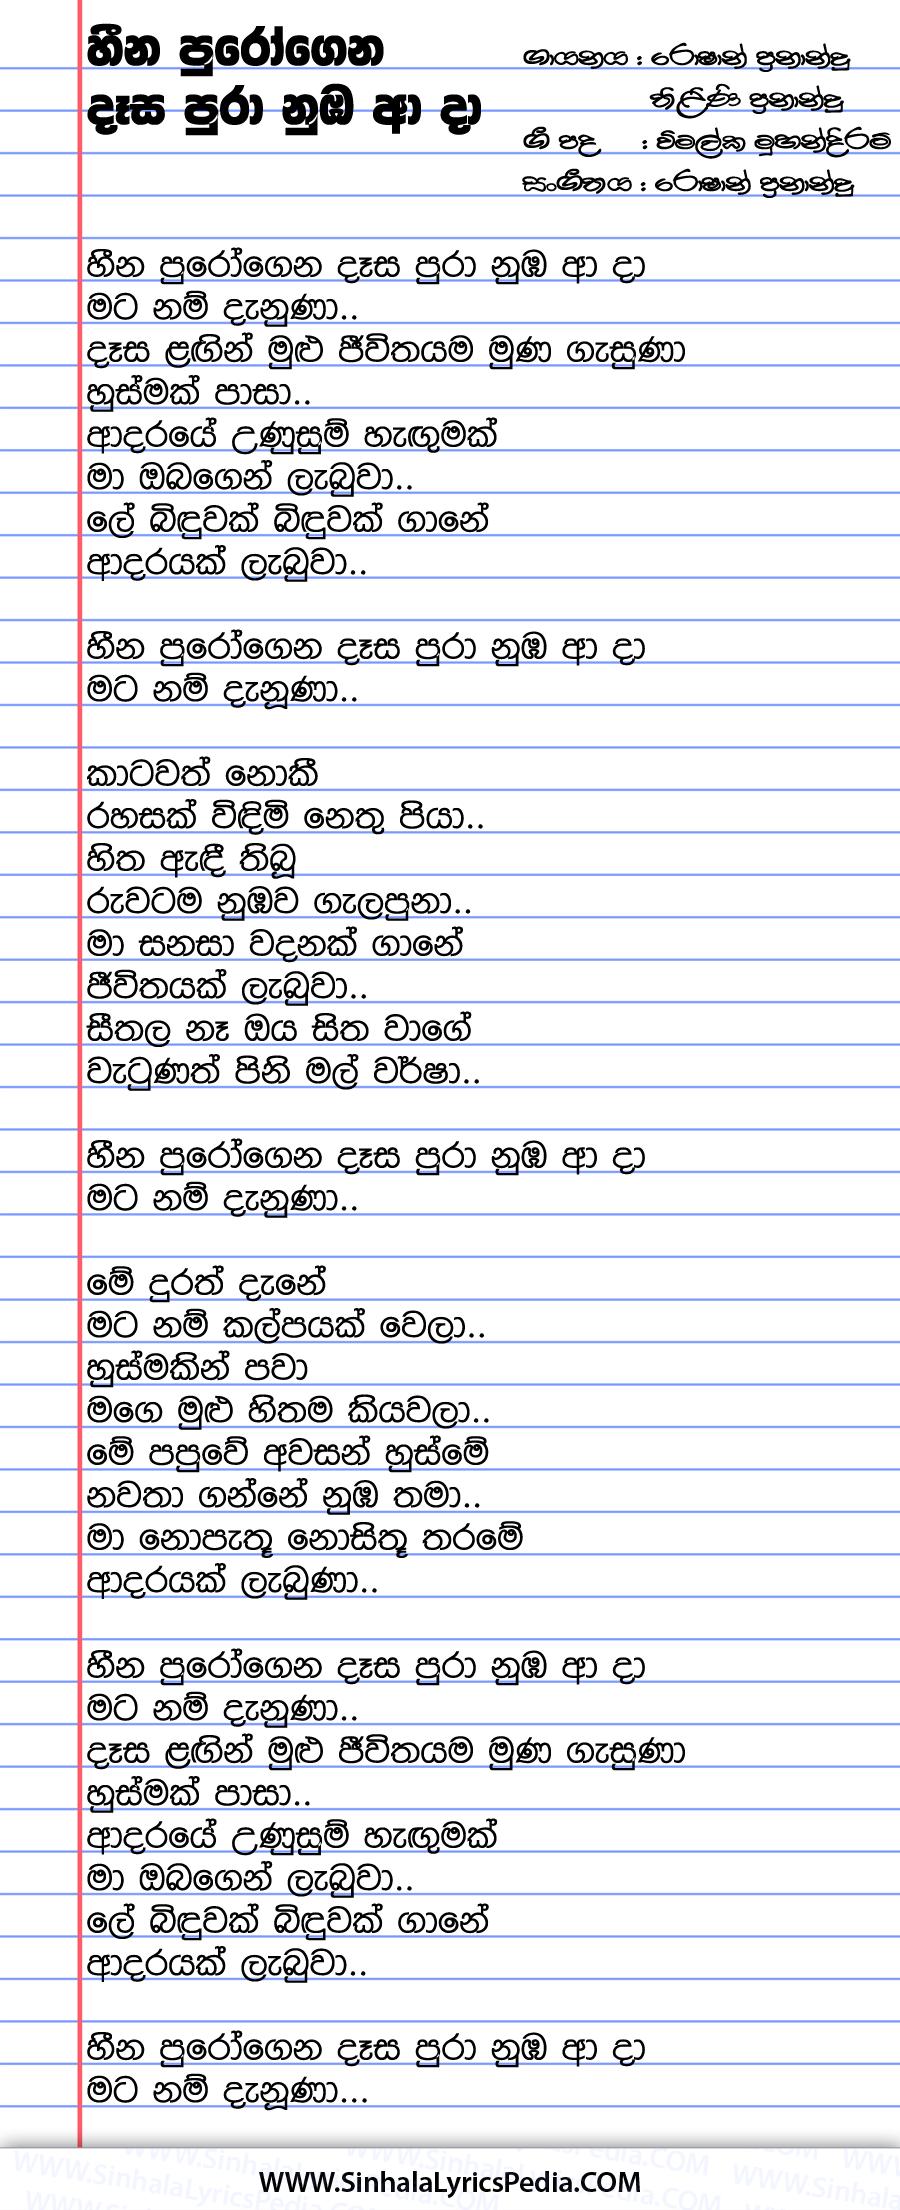 Heena Purogena Dasa Pura Song Lyrics